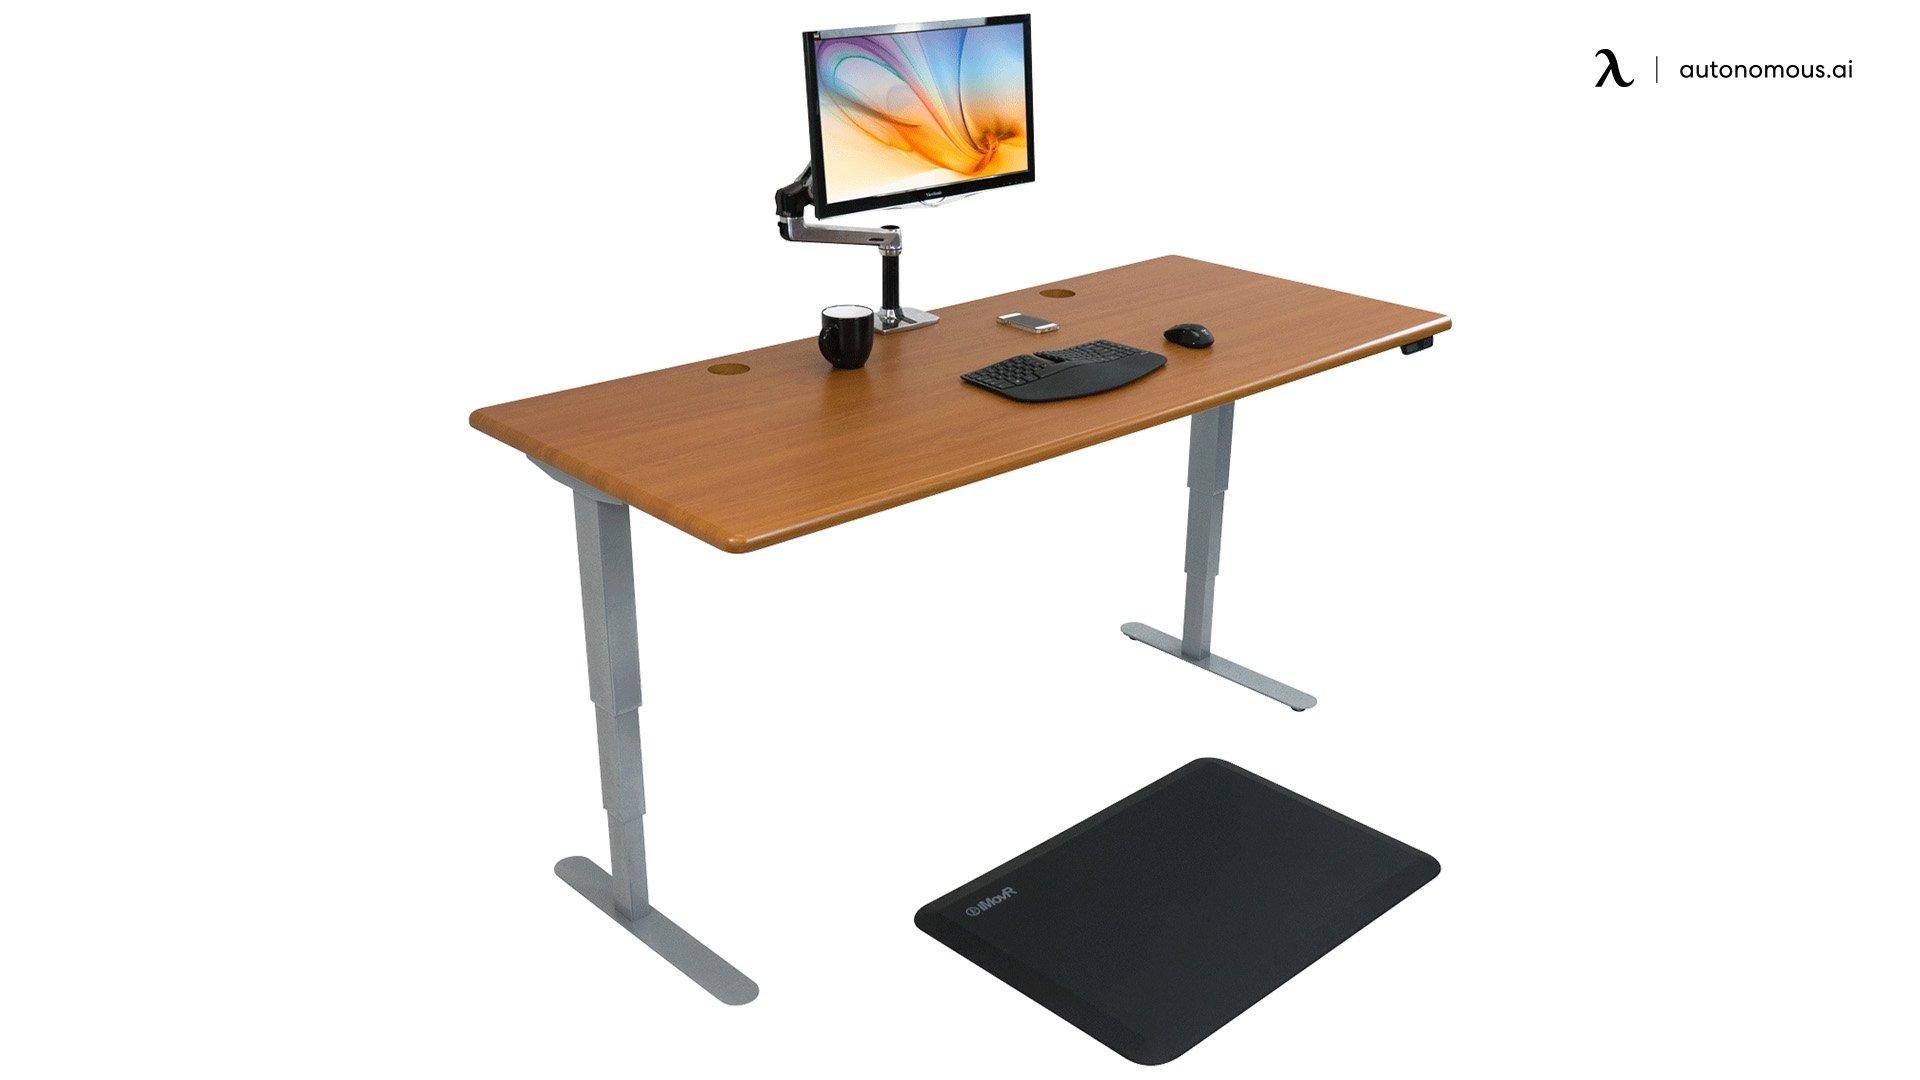 iMovR Cascade Home Office Standing Desk